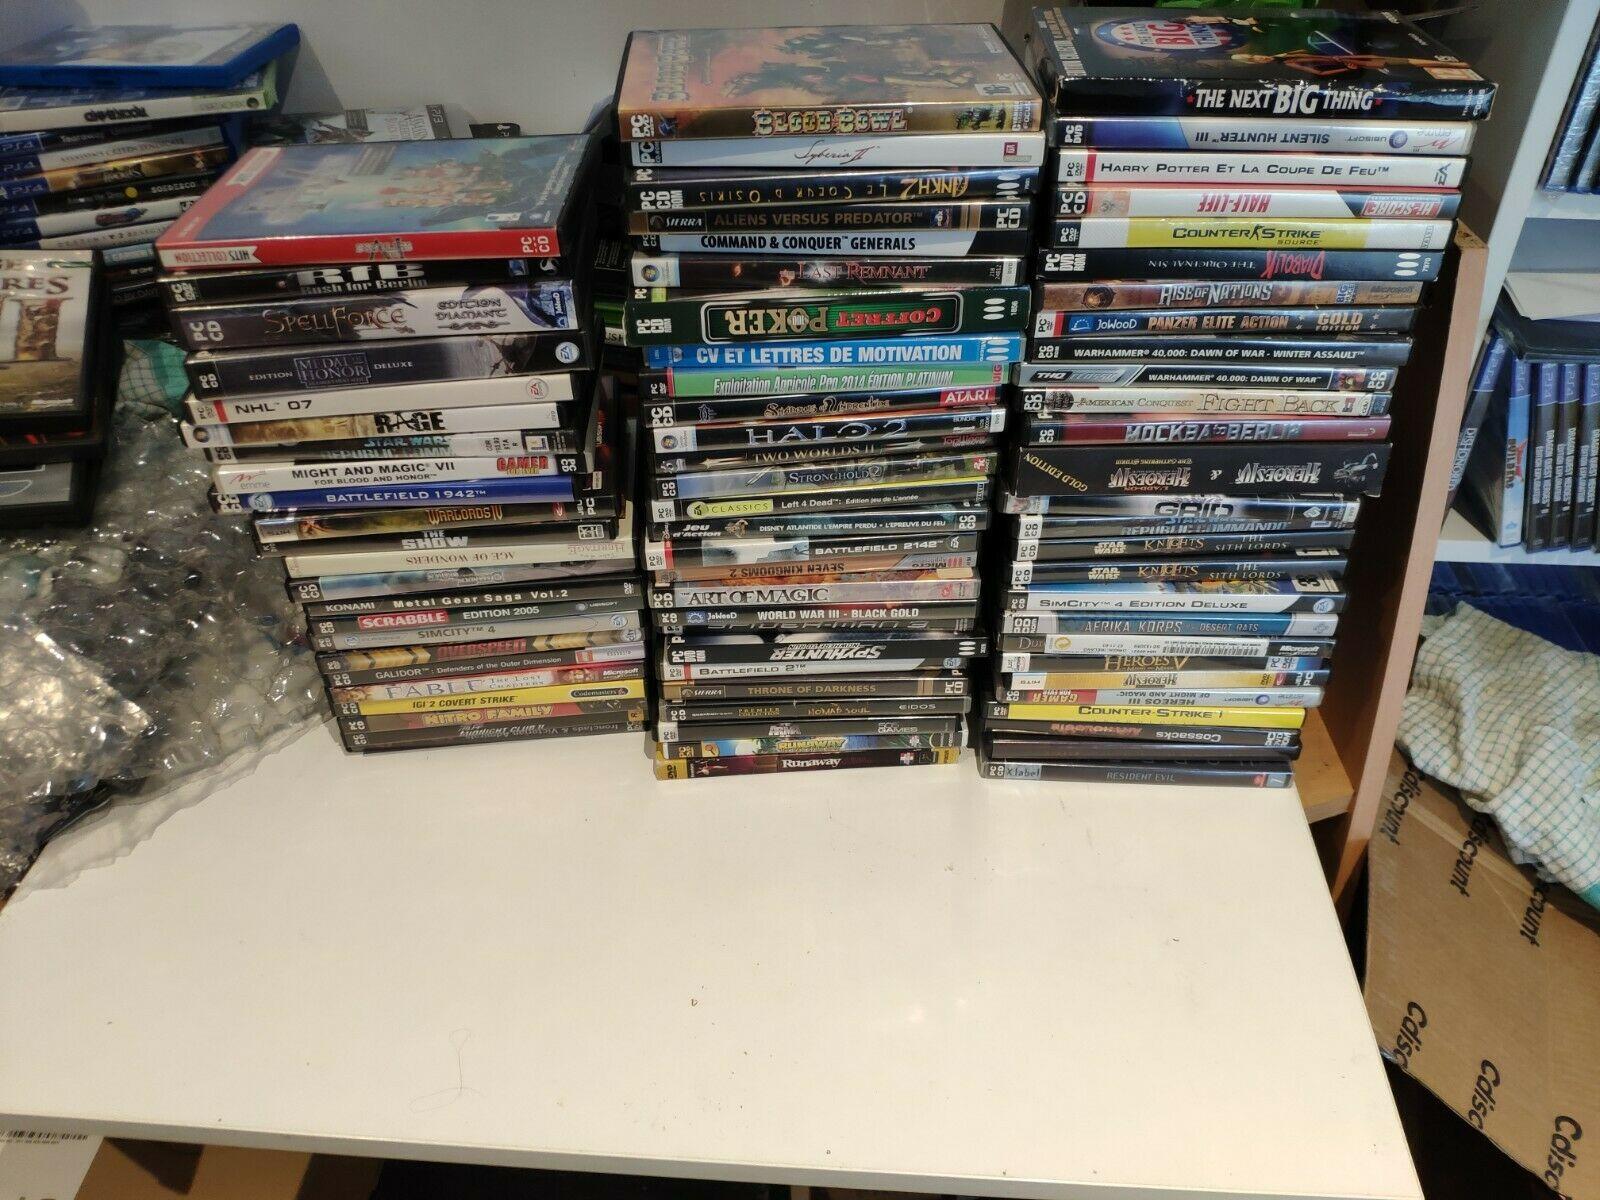 lot 77 jeux pc dvd star wars command and - Bonne affaire StarWars